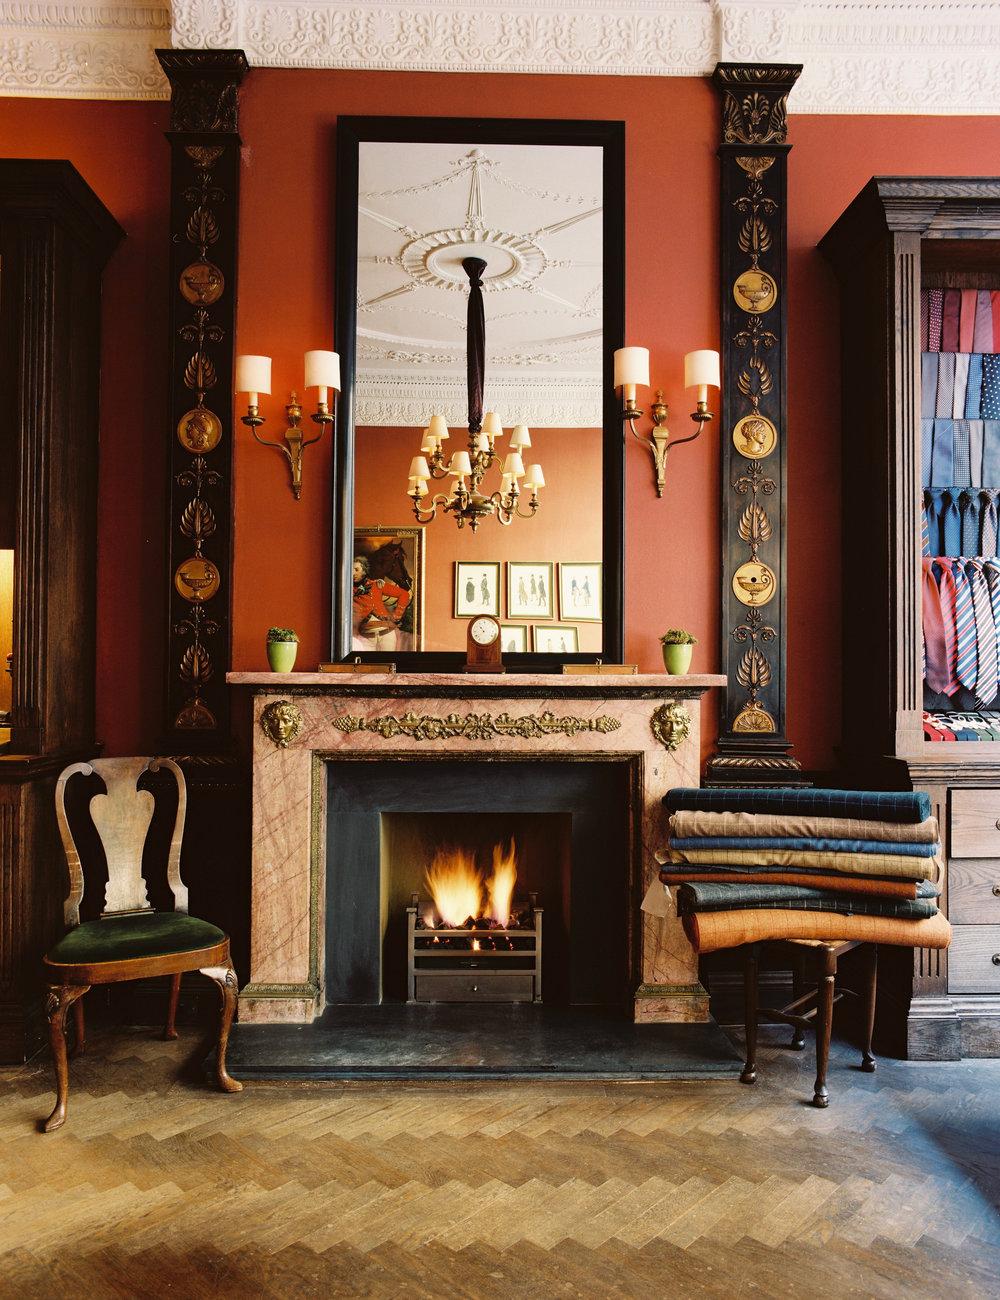 Anderson & Sheppard Bespoke Shop Fireplace.jpg